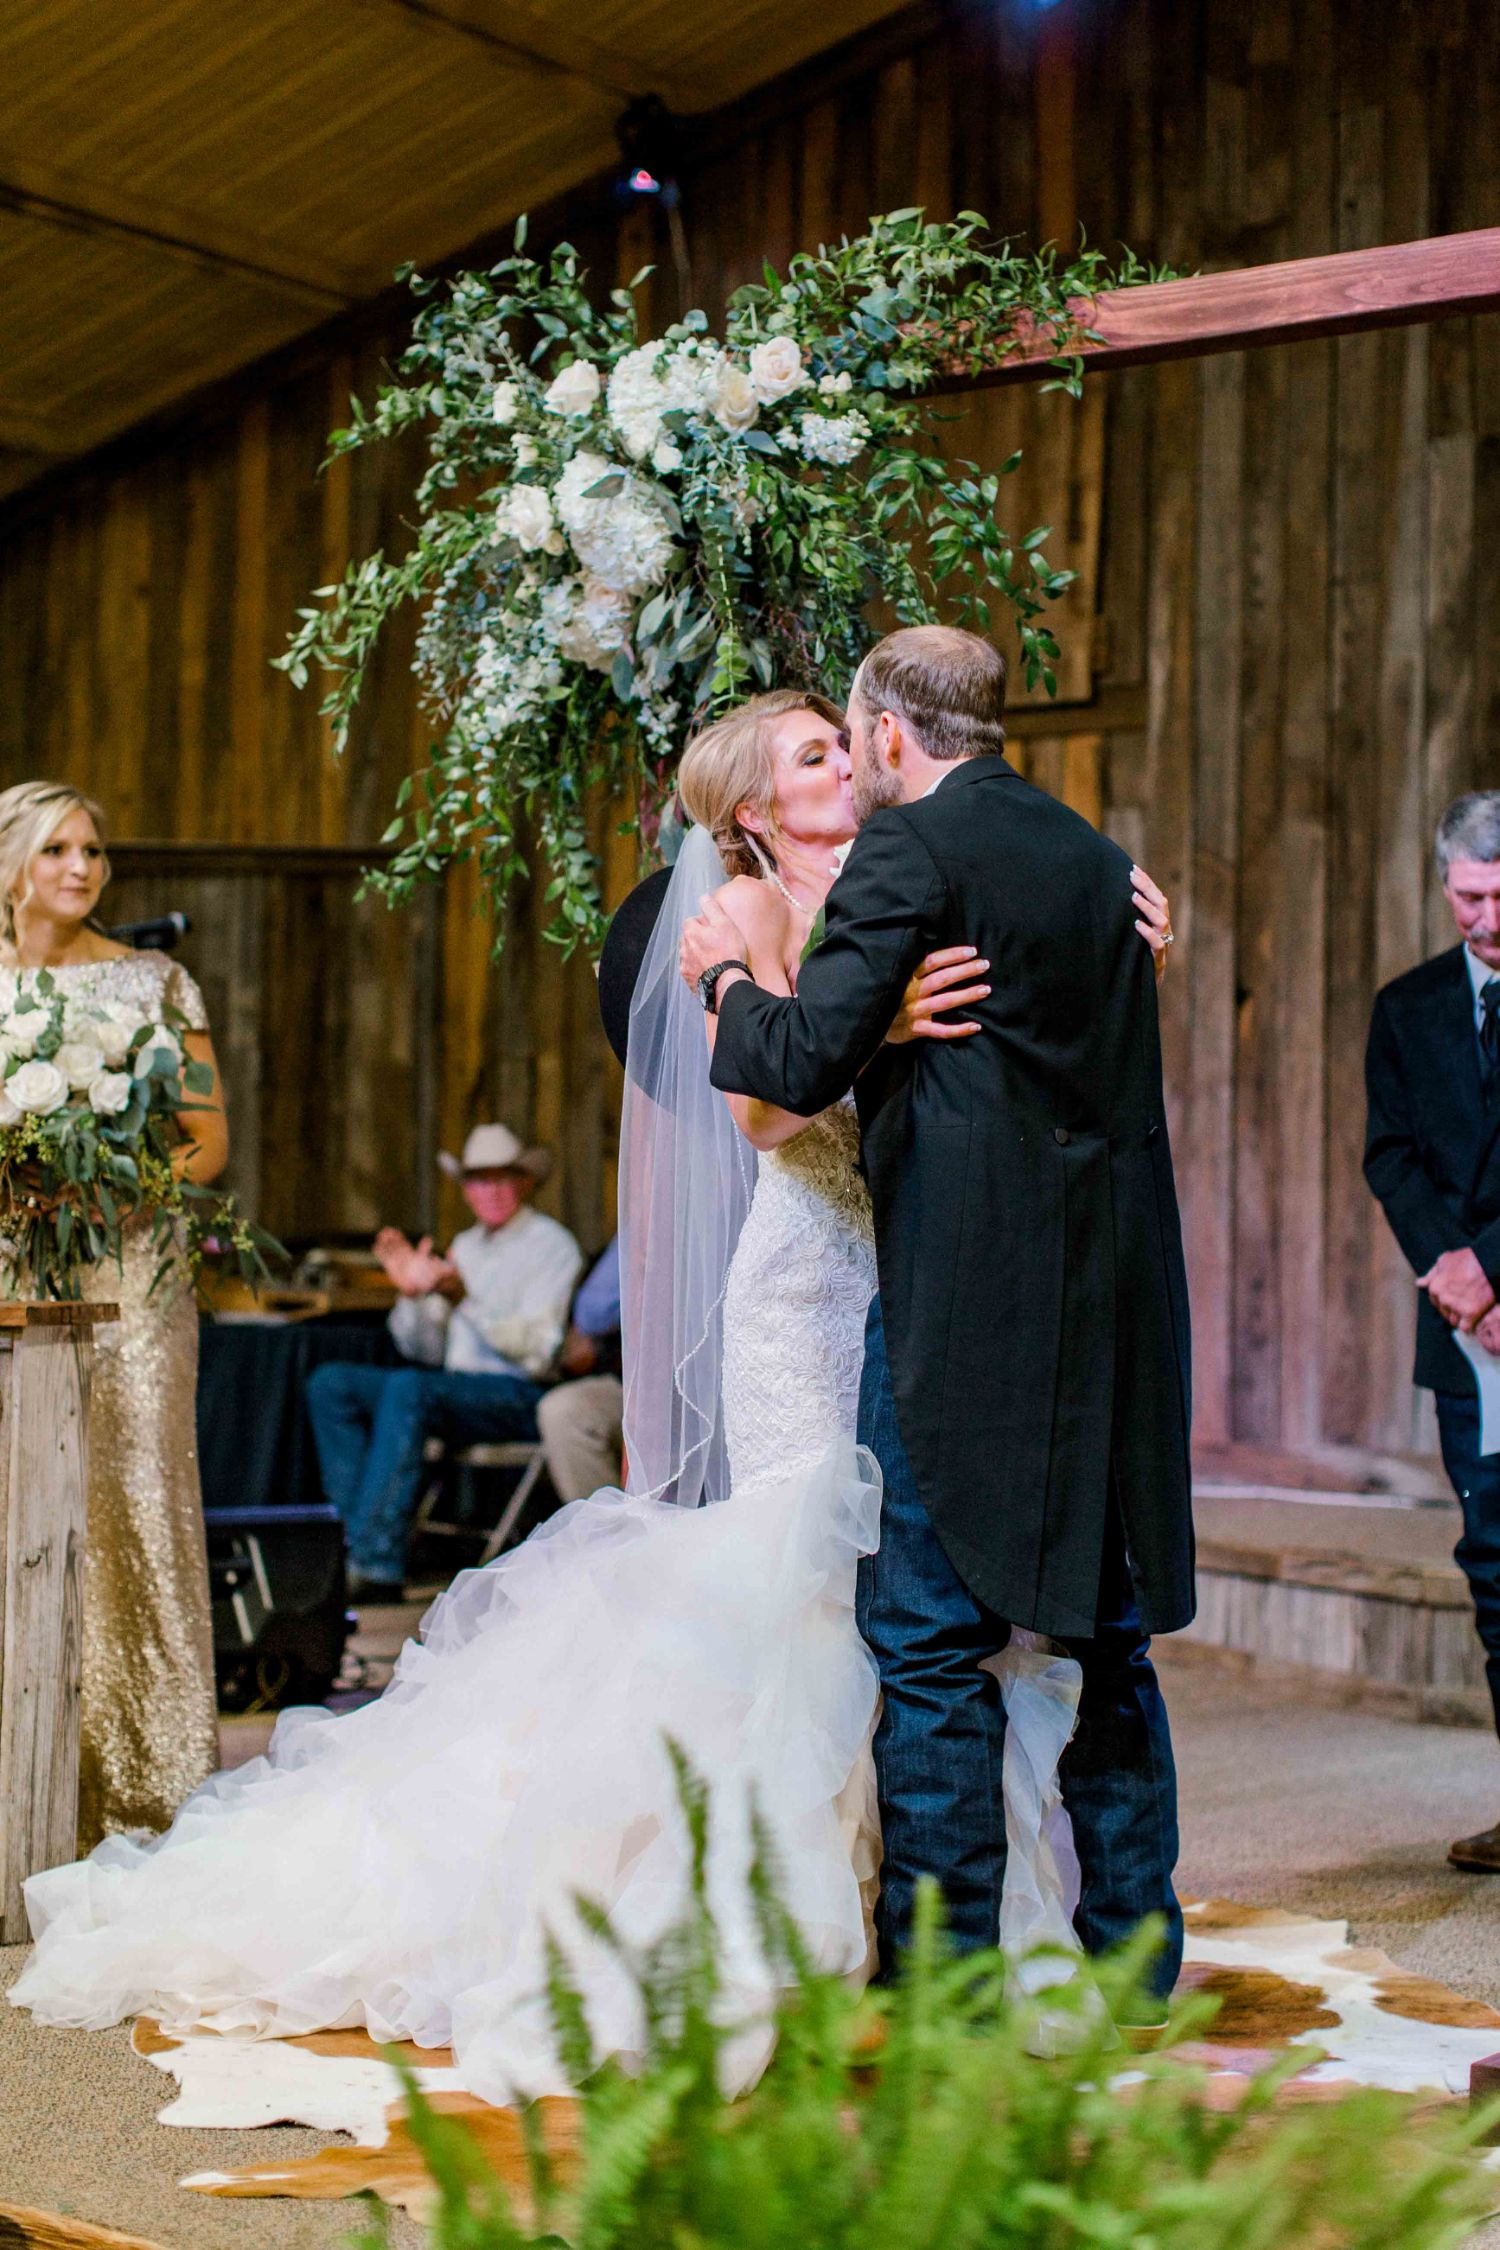 wichita-falls-wedding-katelyn-colten-vernon-texas-29.jpg